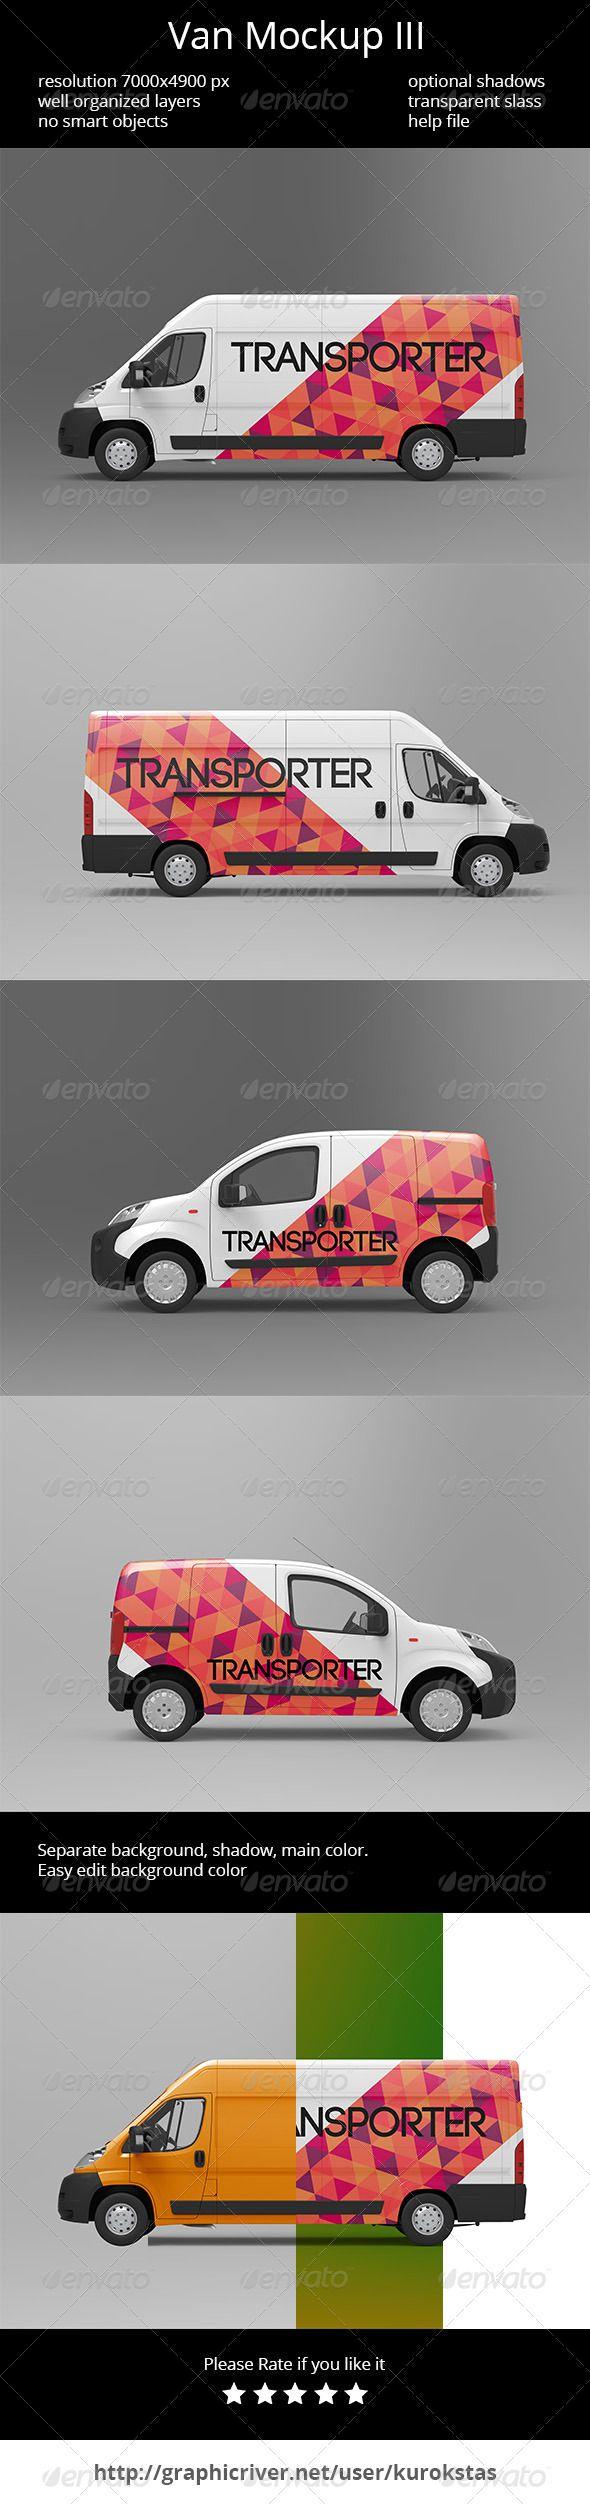 Van Mockup III — Photoshop PSD #mock up #design • Available here → https://graphicriver.net/item/van-mockup-iii/6901140?ref=pxcr